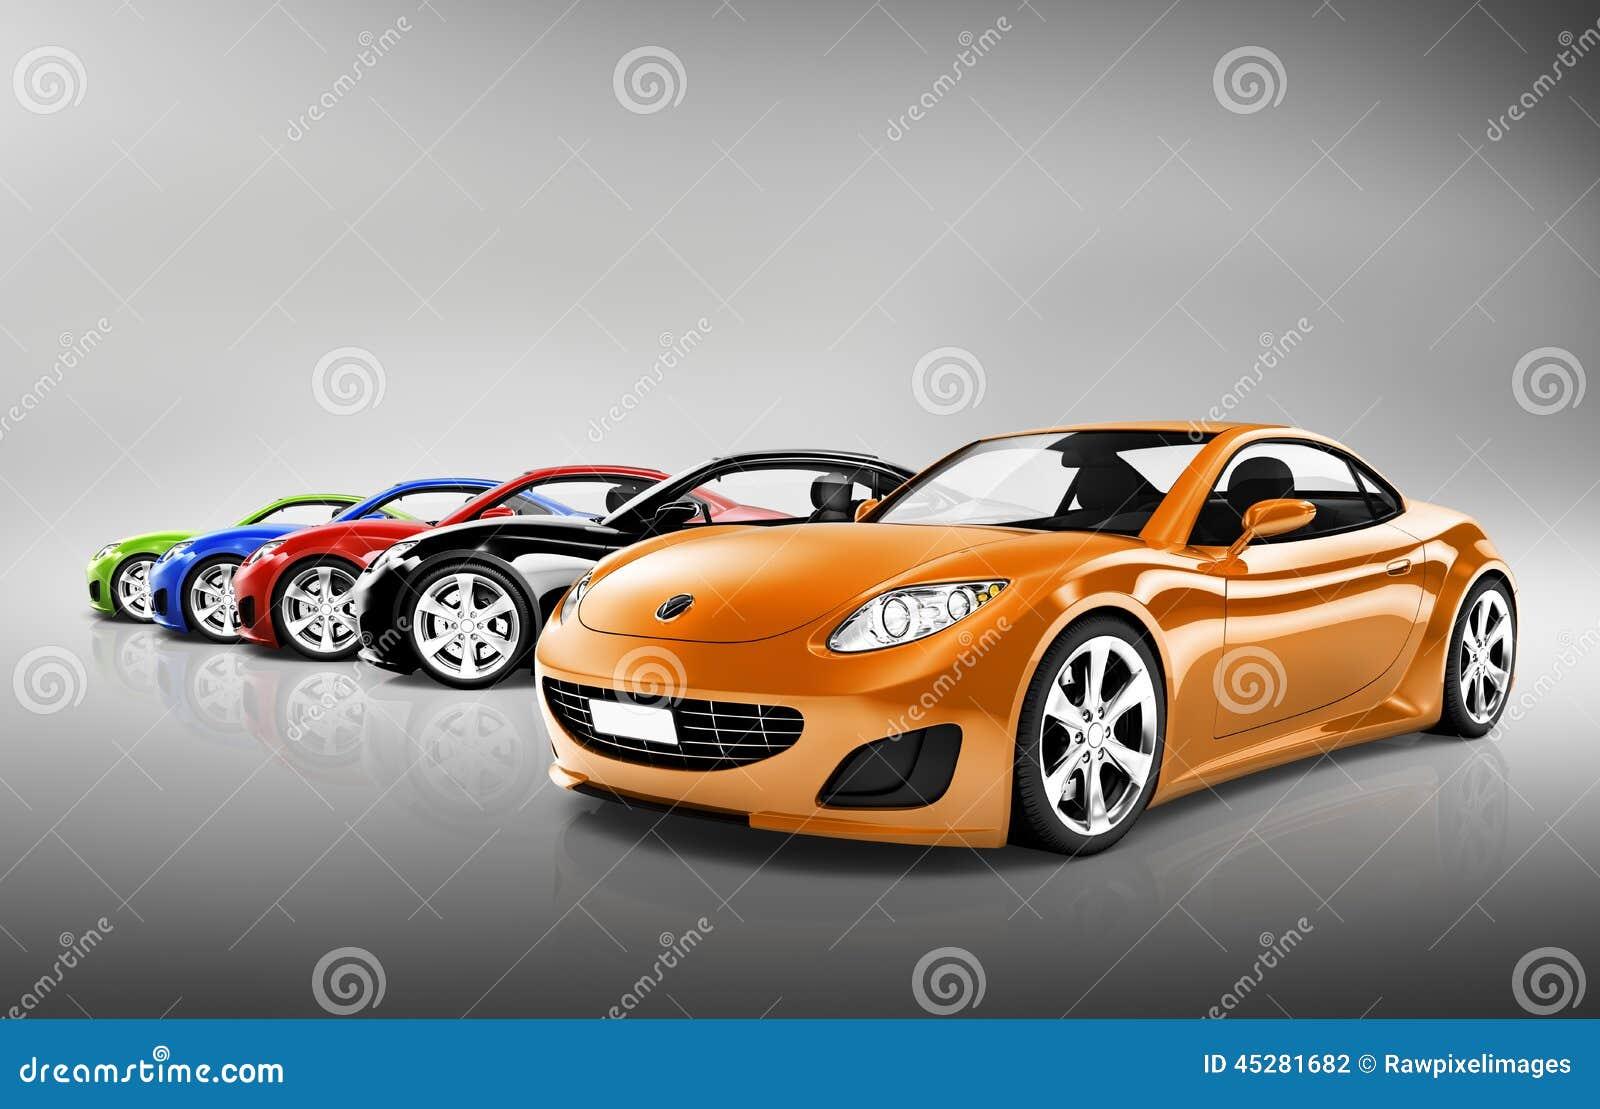 Contemporary Shiny Sports Car Collection Stock Photo